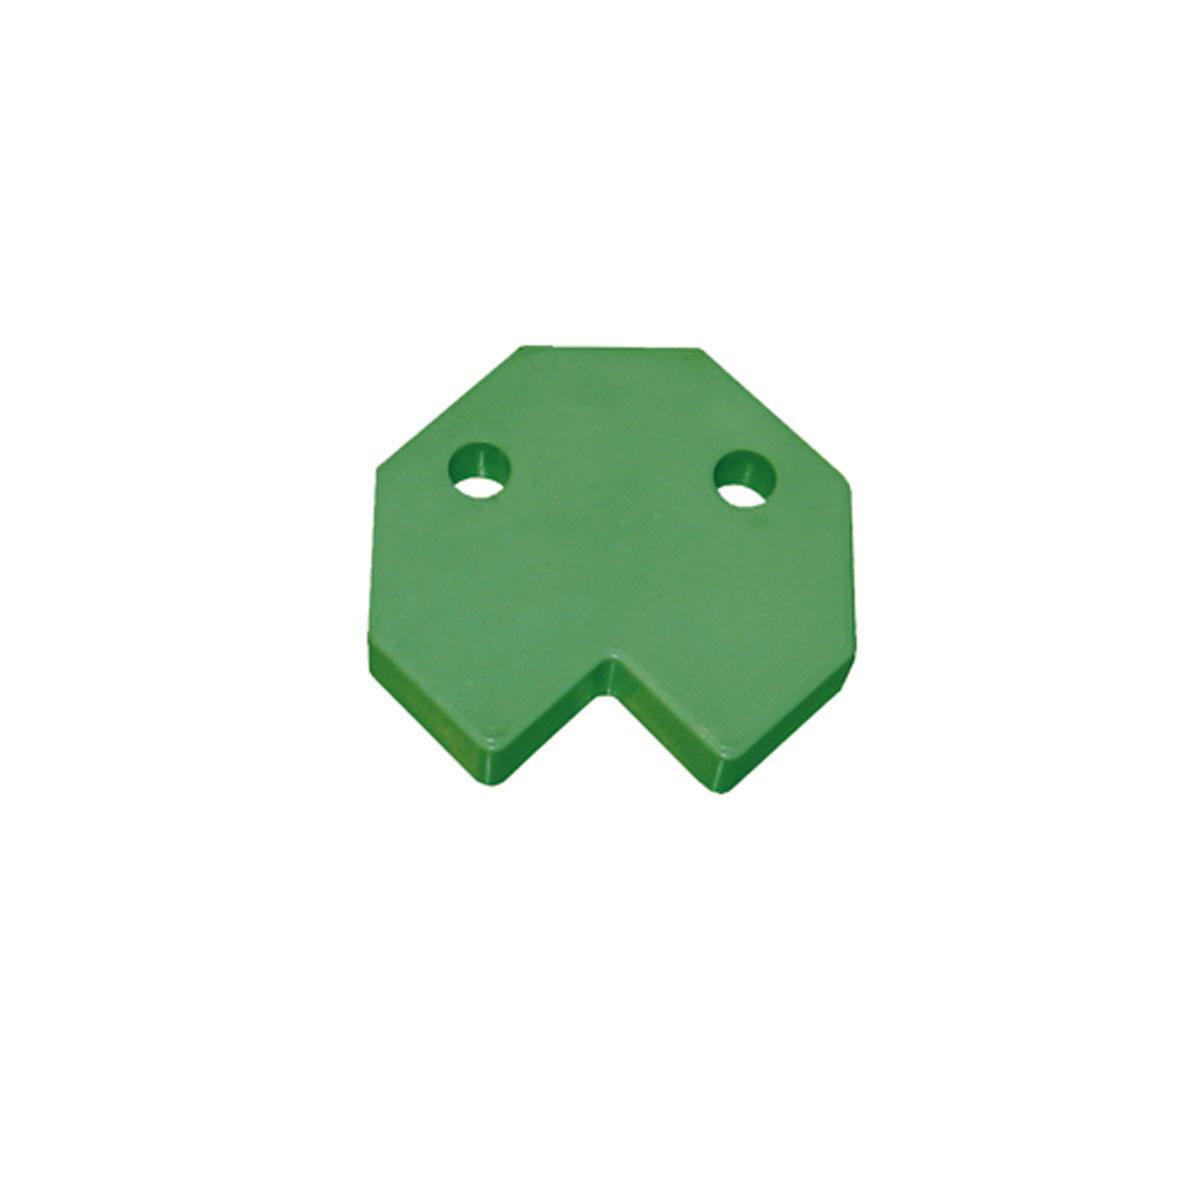 styrflans-hardplast